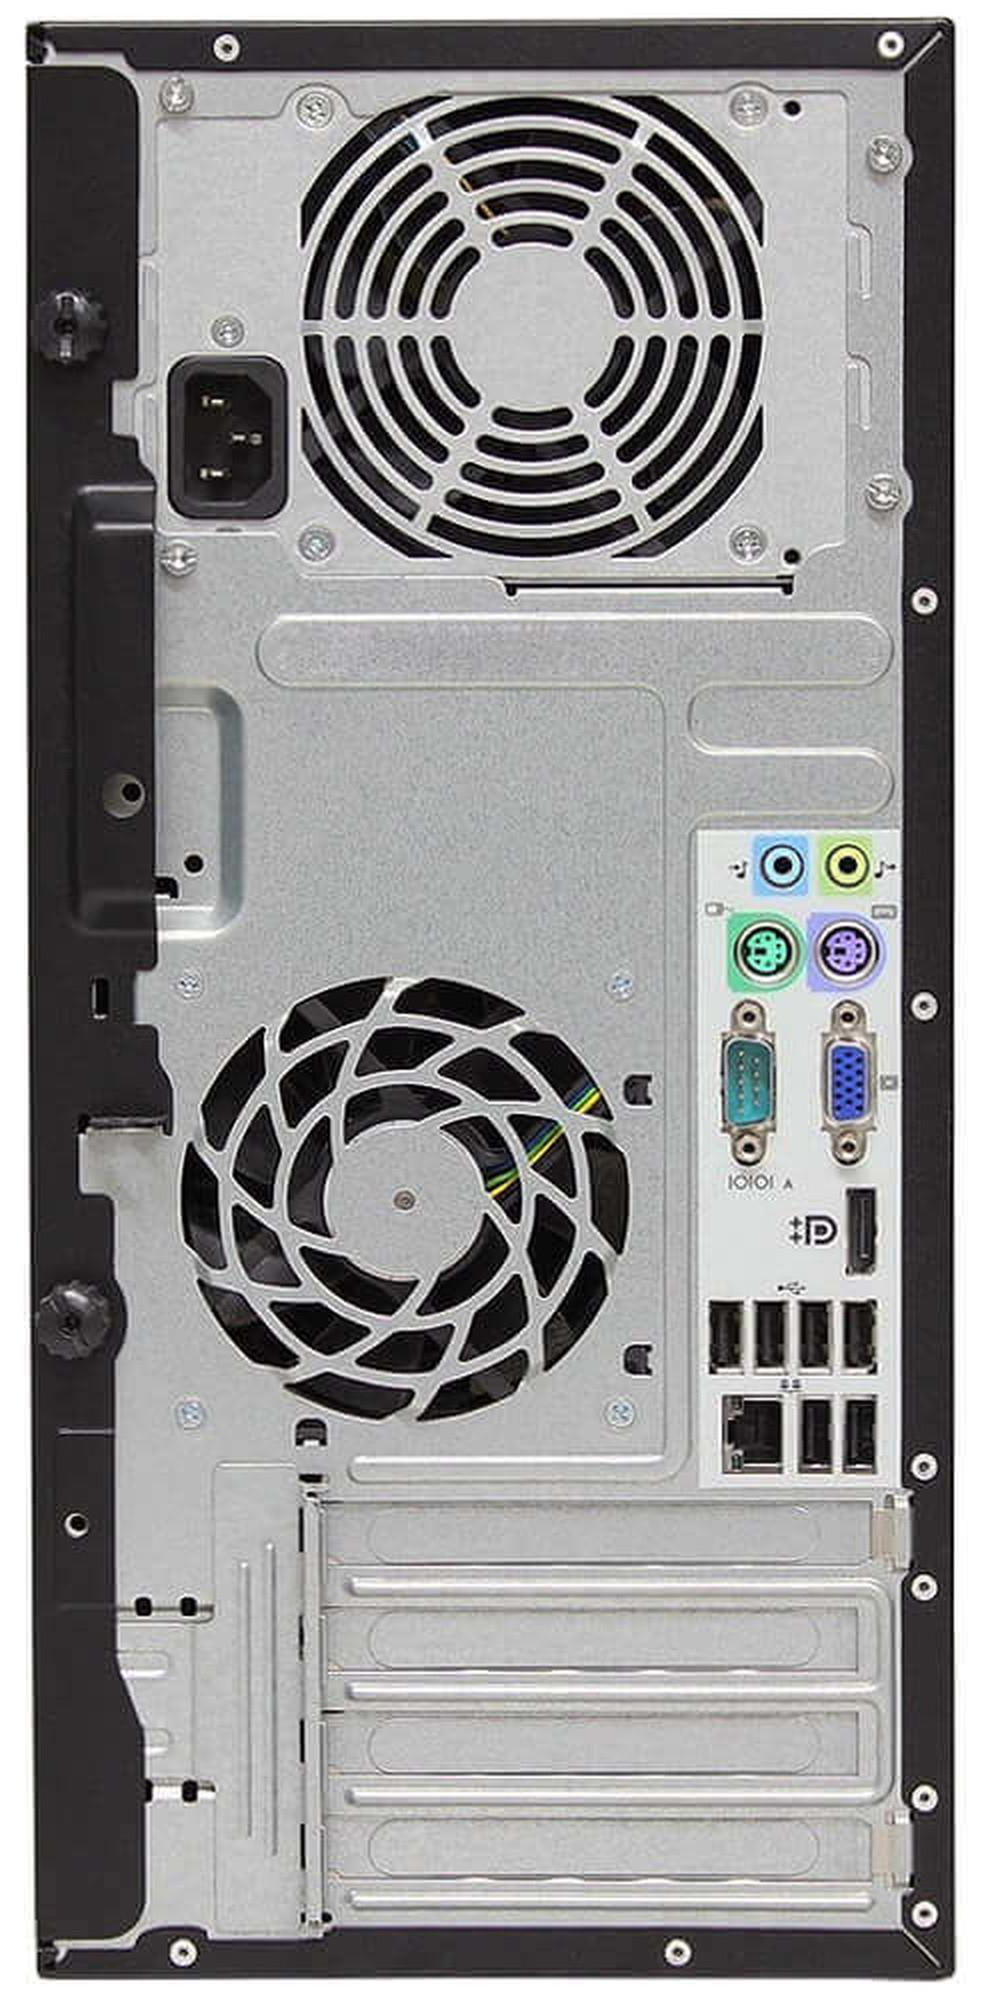 HP Compaq 6005 Pro Microtower